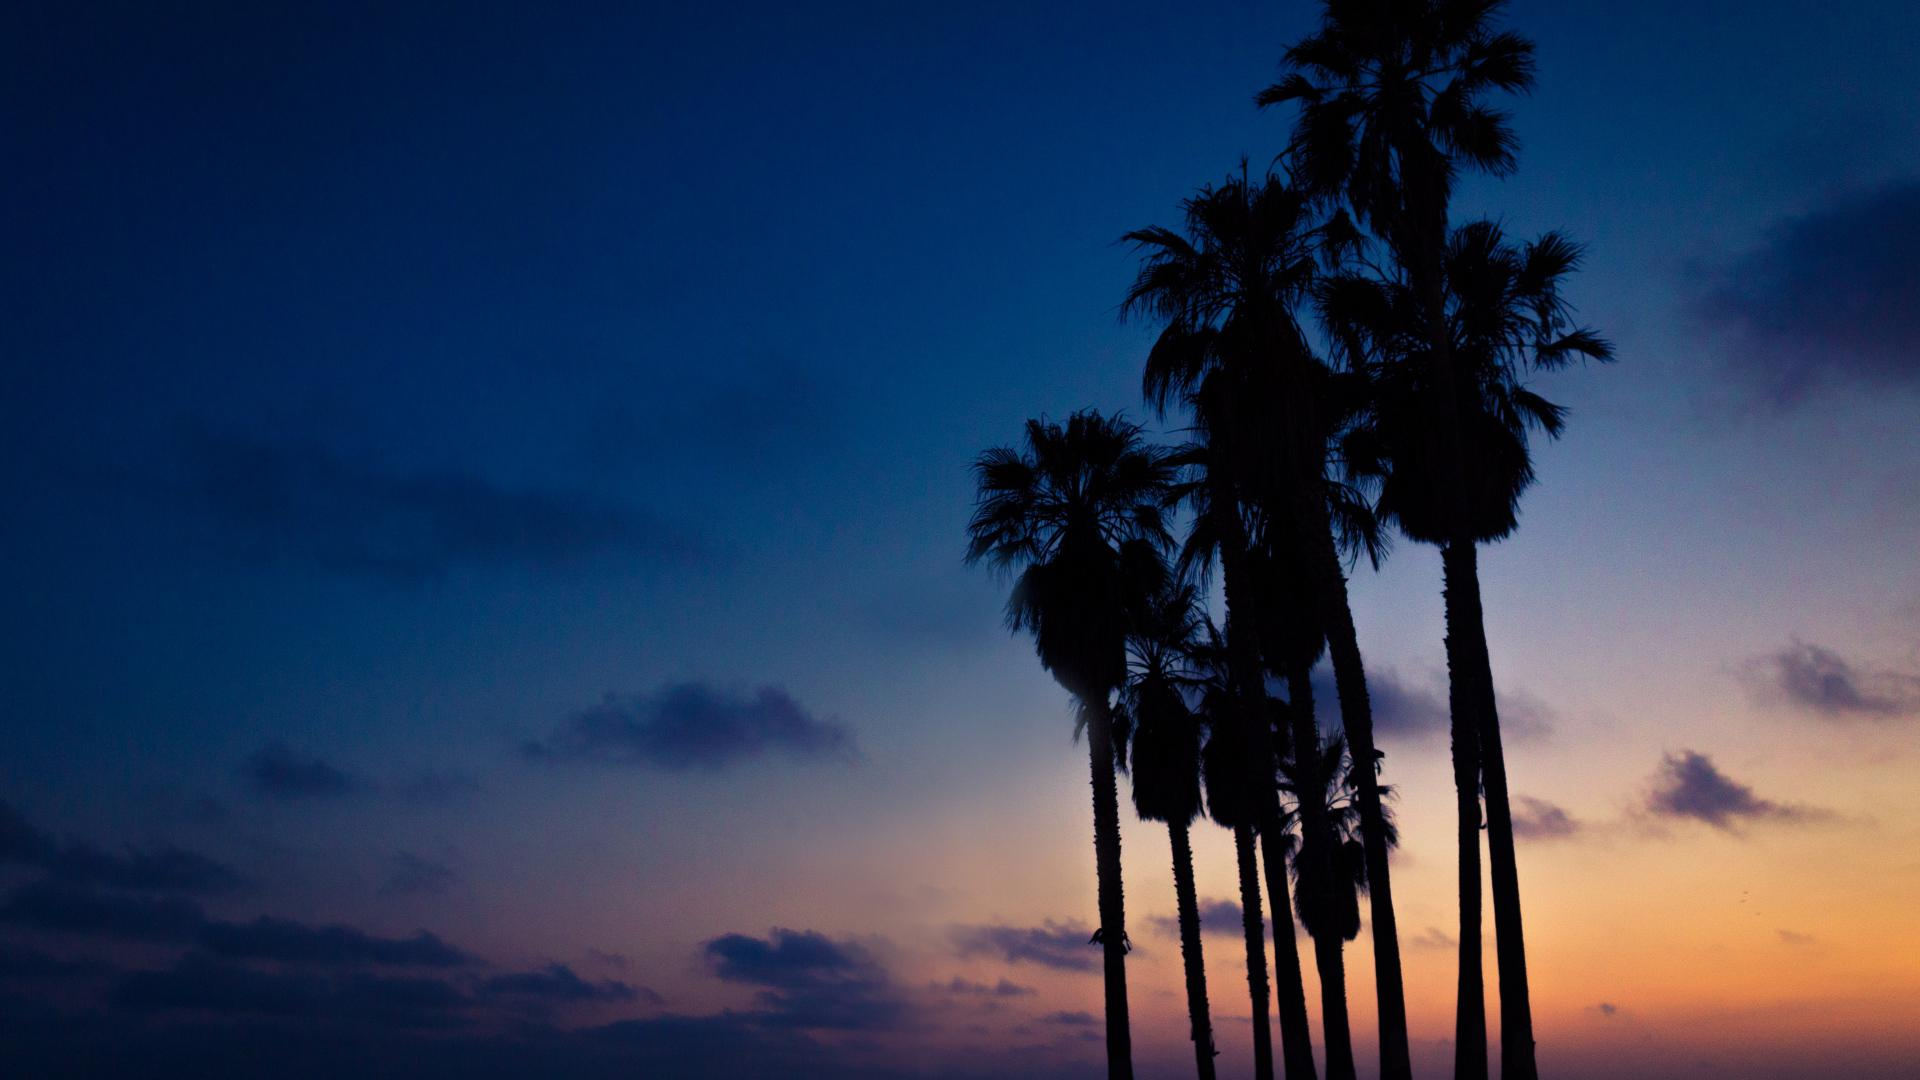 hd hintergrundbilder himmel palmen nacht 1920x1080